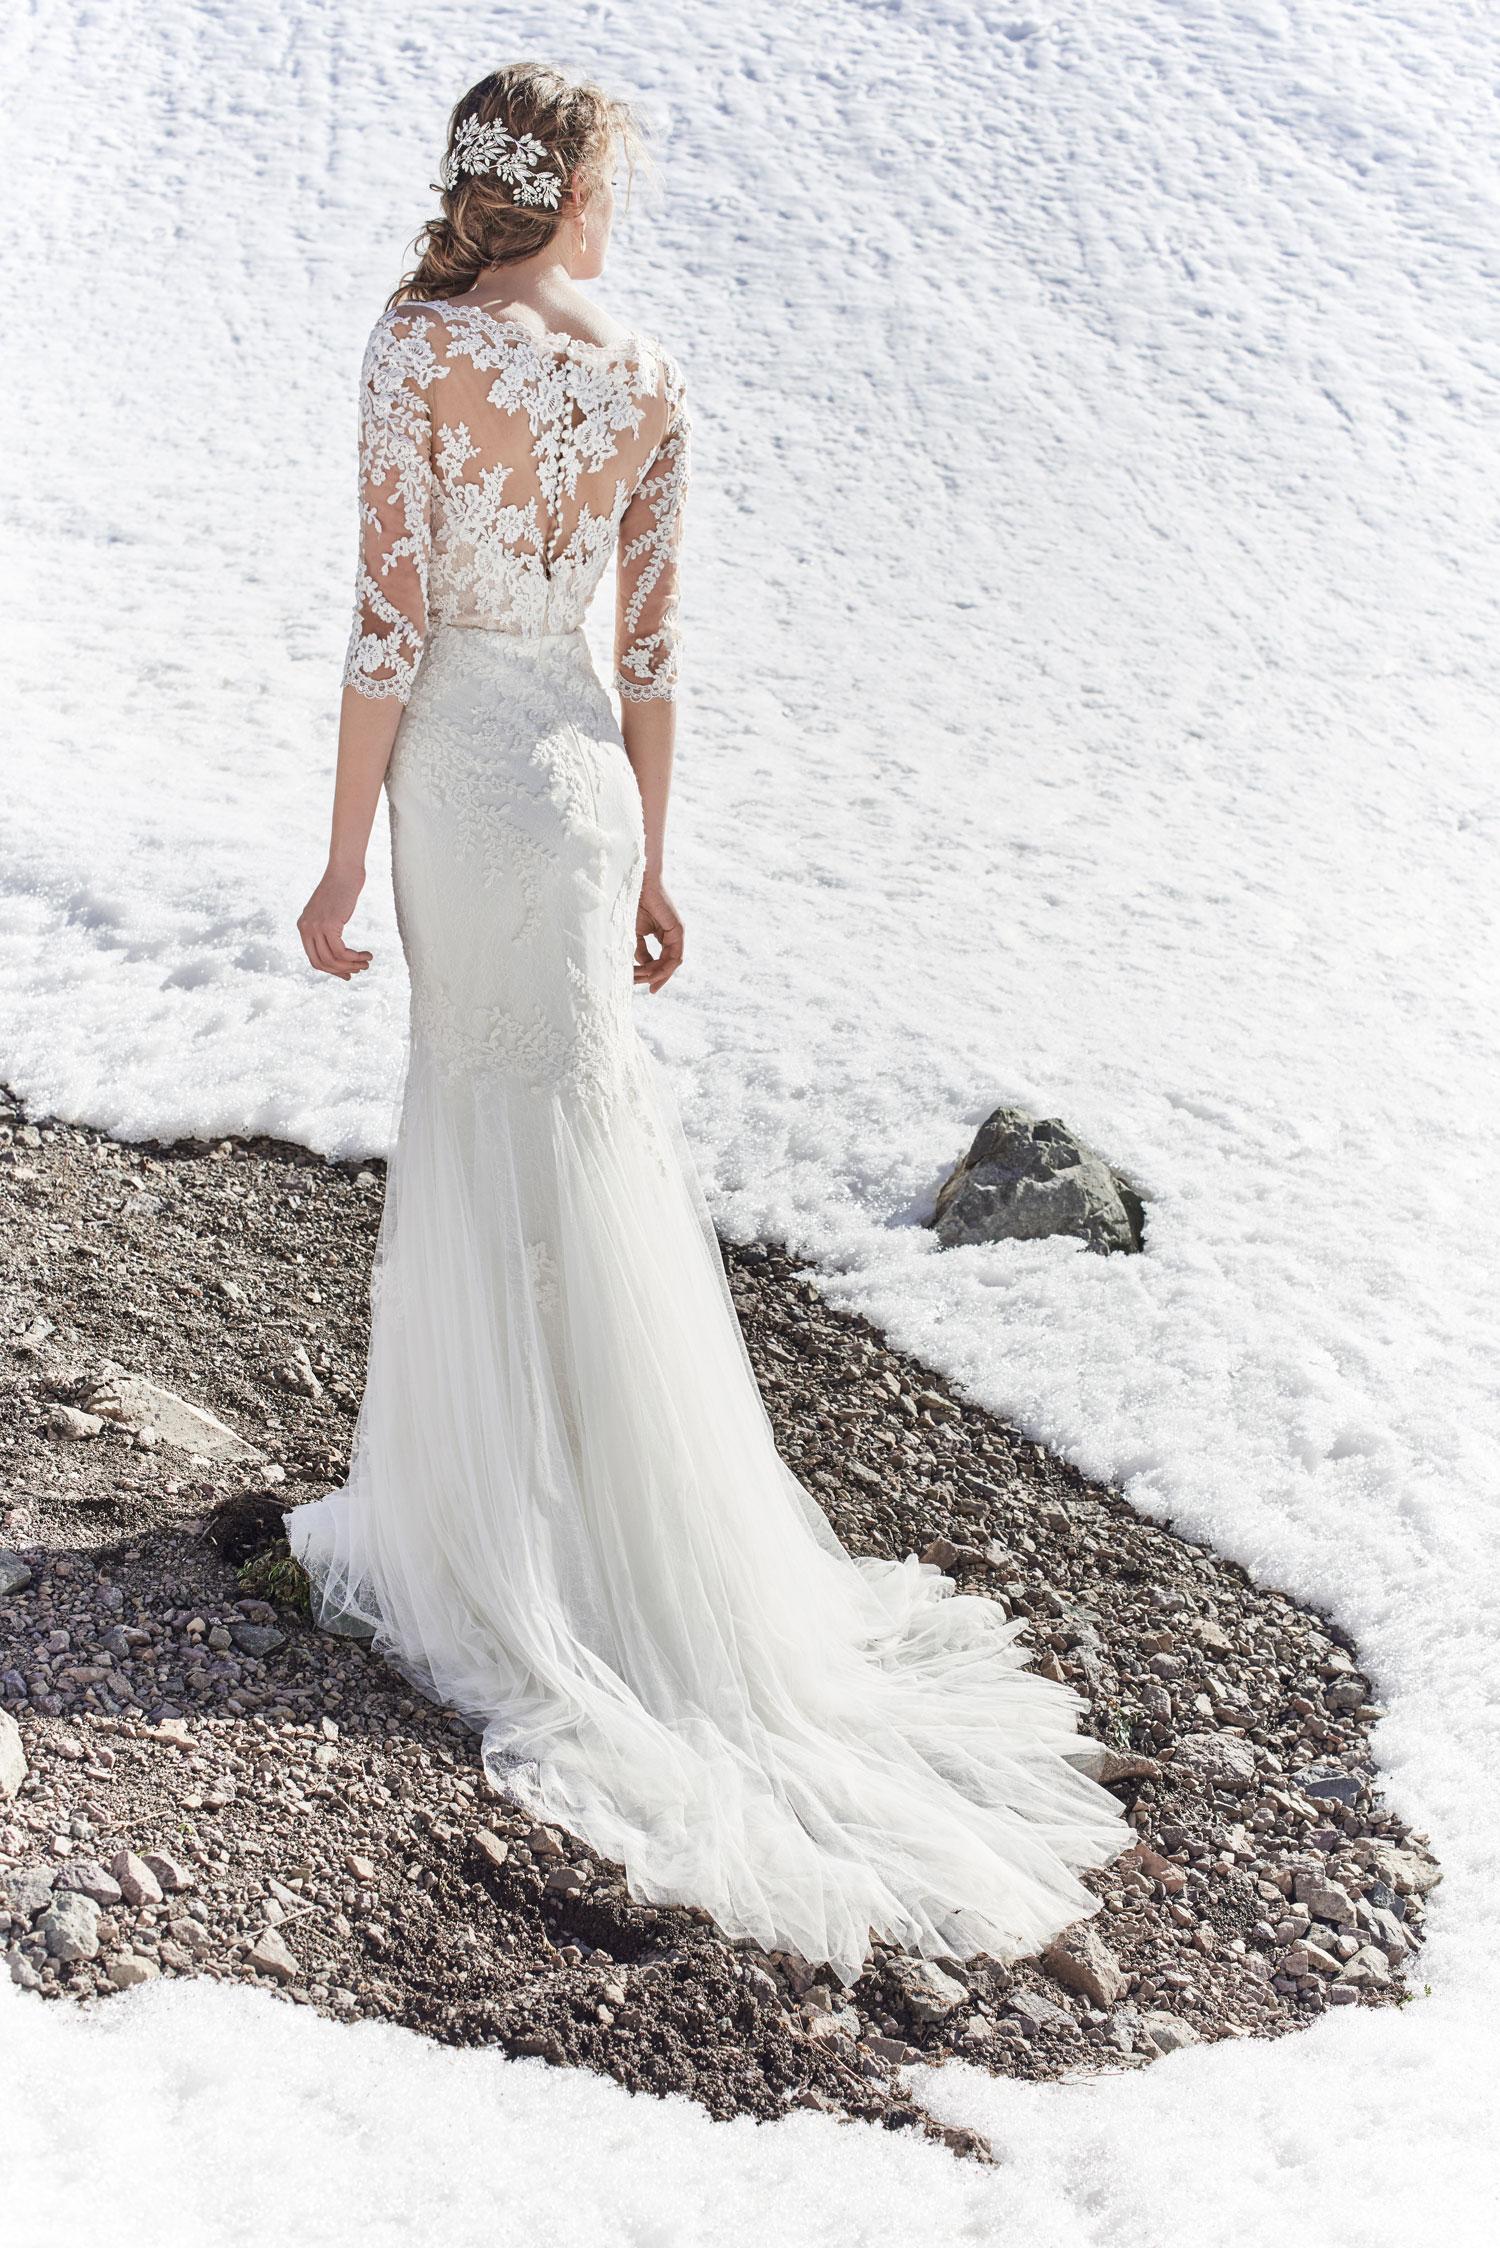 BHLDN back of Pique wedding dress illusion details